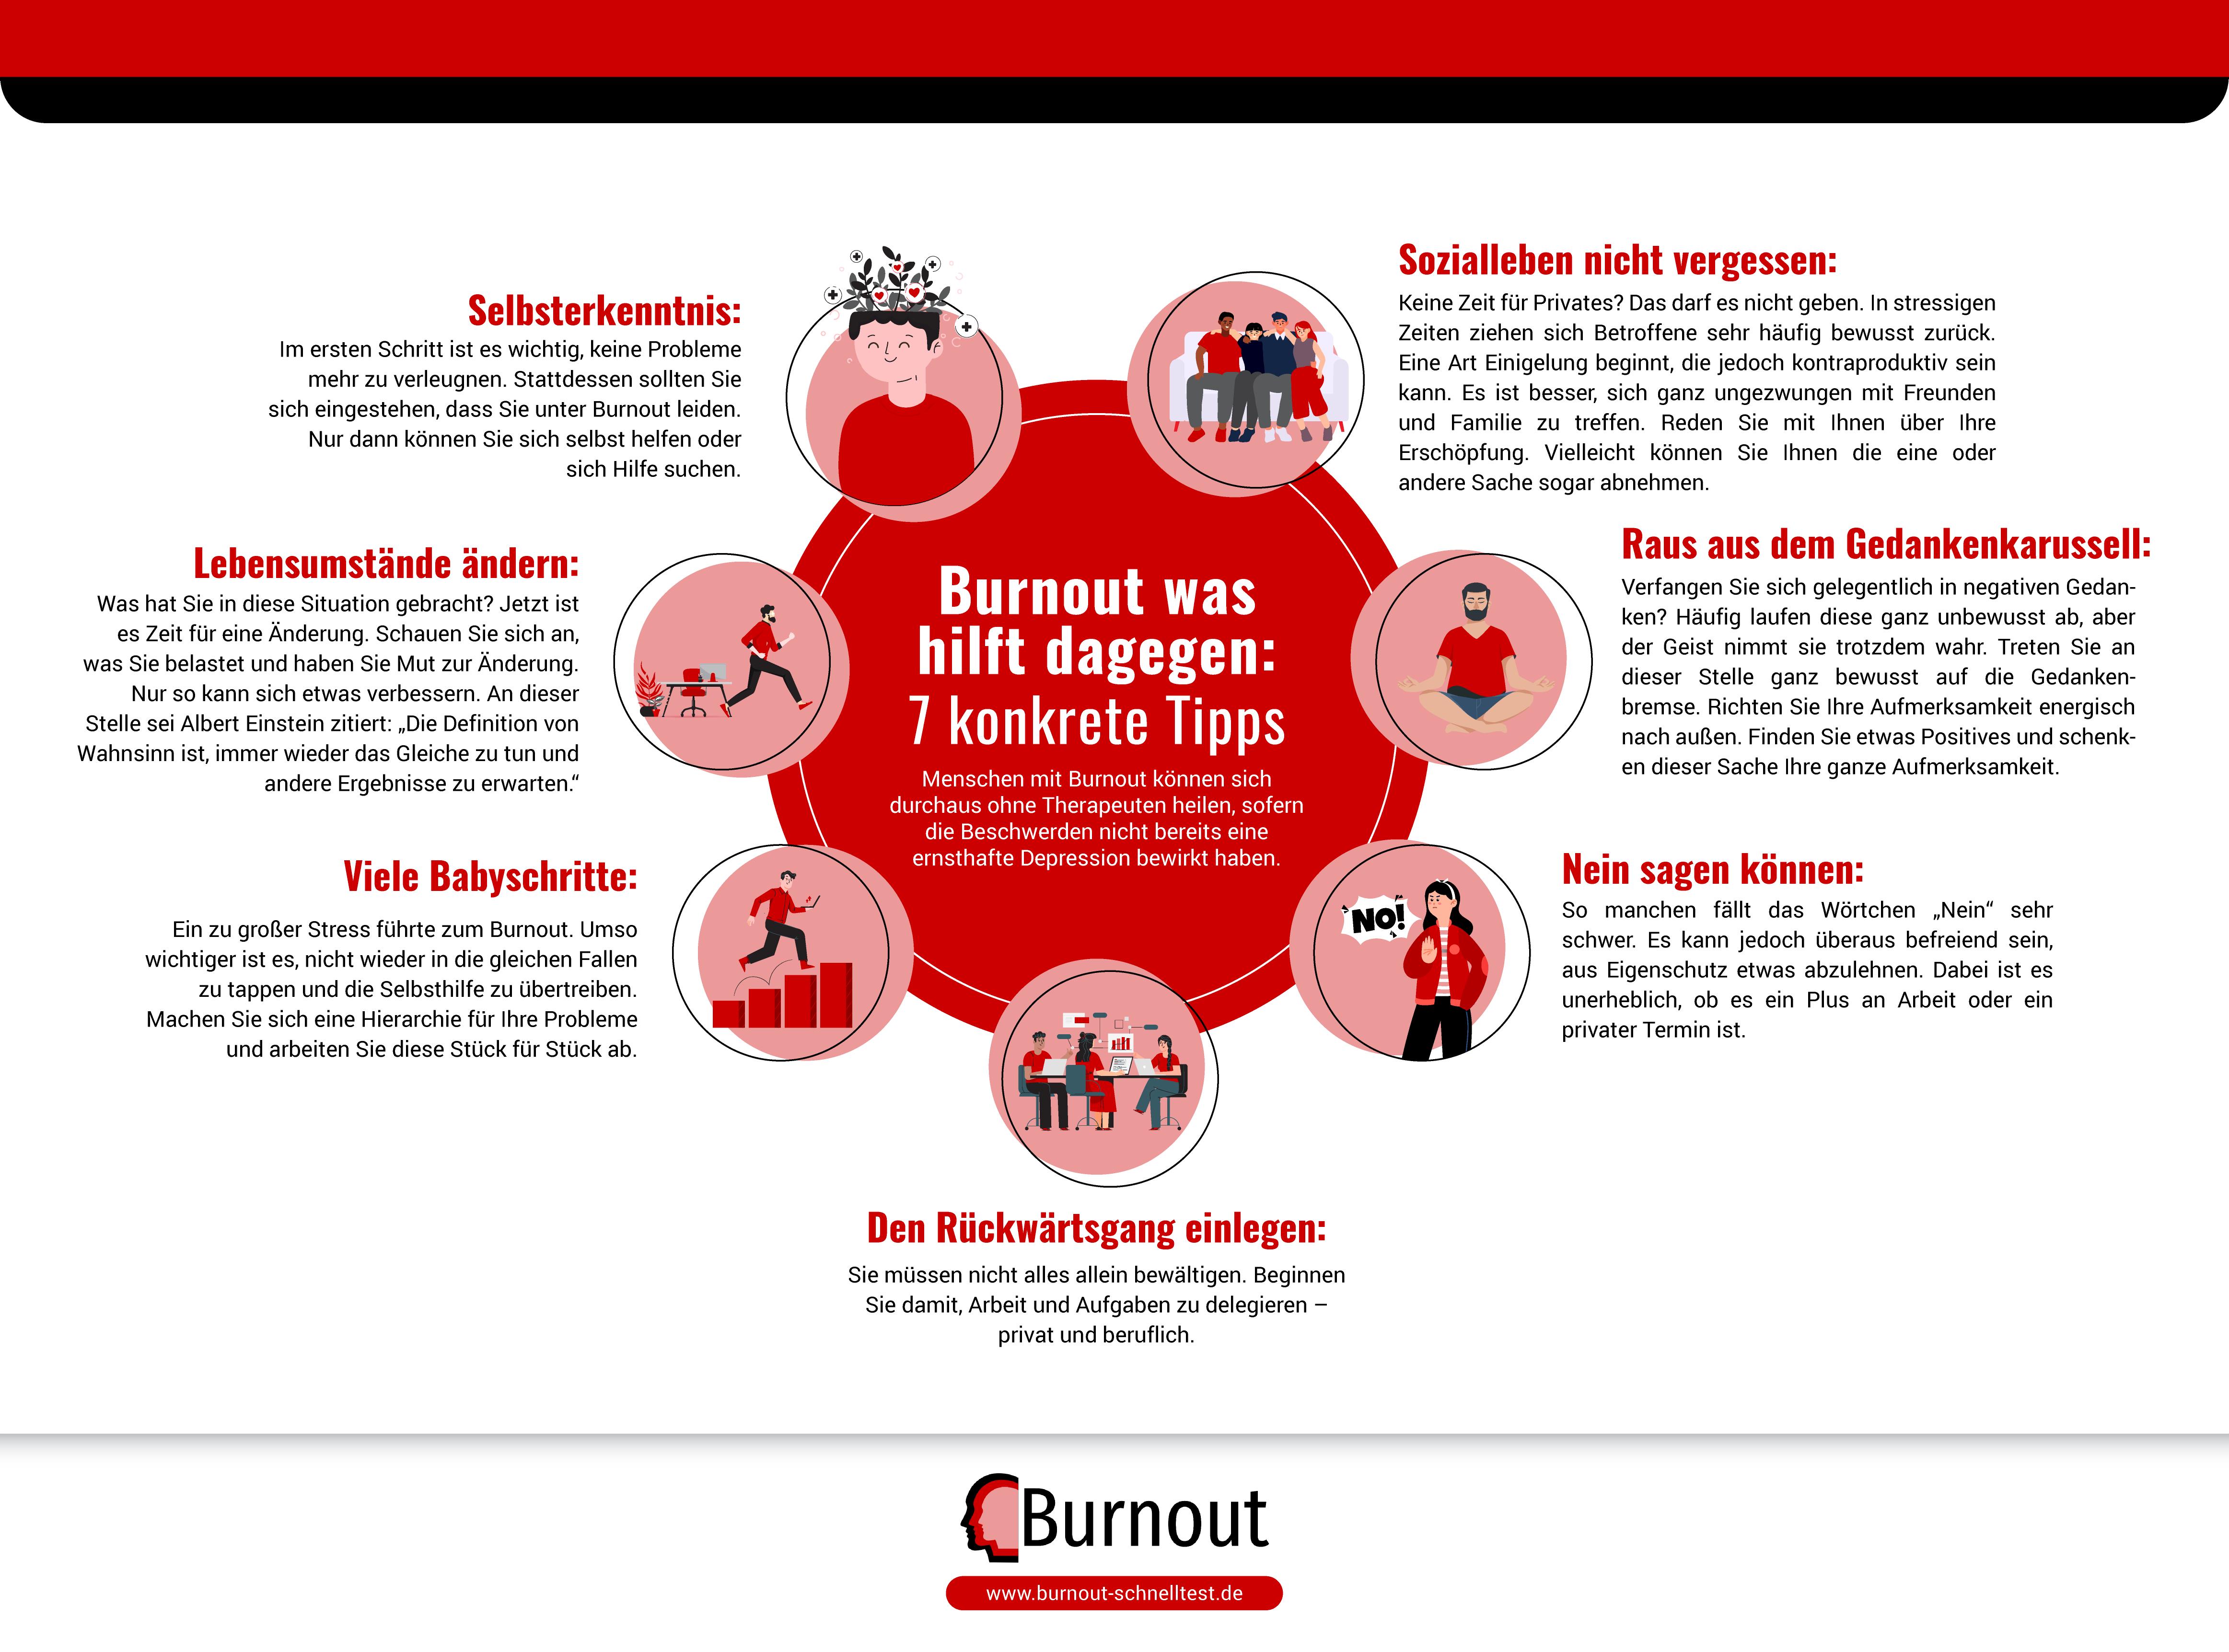 Infografik Burnout was hilft dagegen - 7 konkrete Tipps